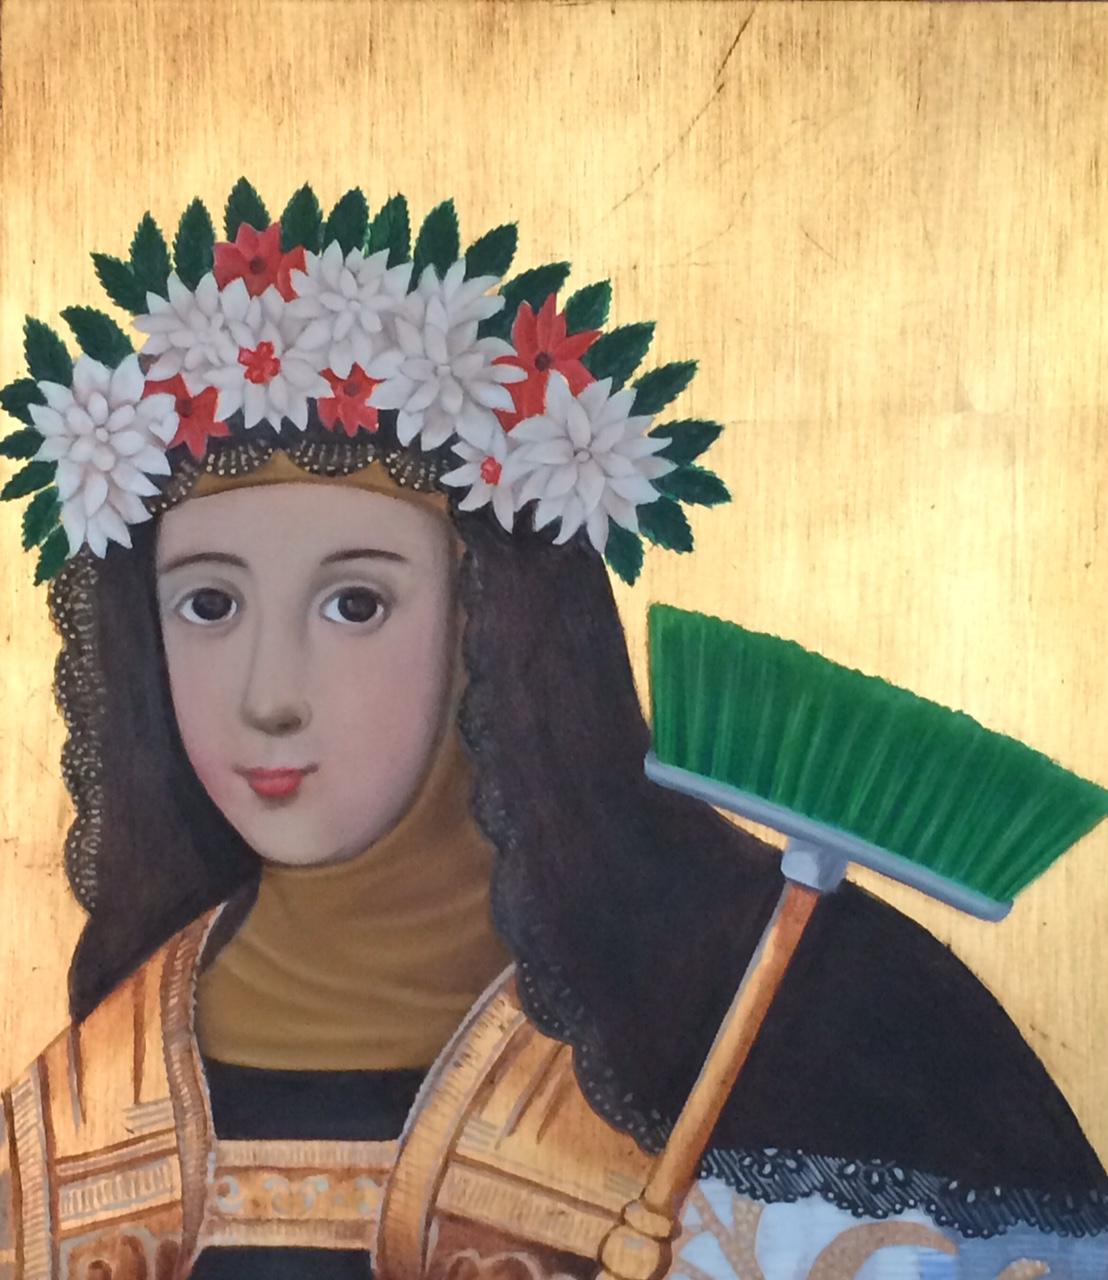 Santa Clara, from the serie holly office. EN-BOLA-ATADOS. Oil on wood whit gold leaf. 38 x 33 cms. 2015